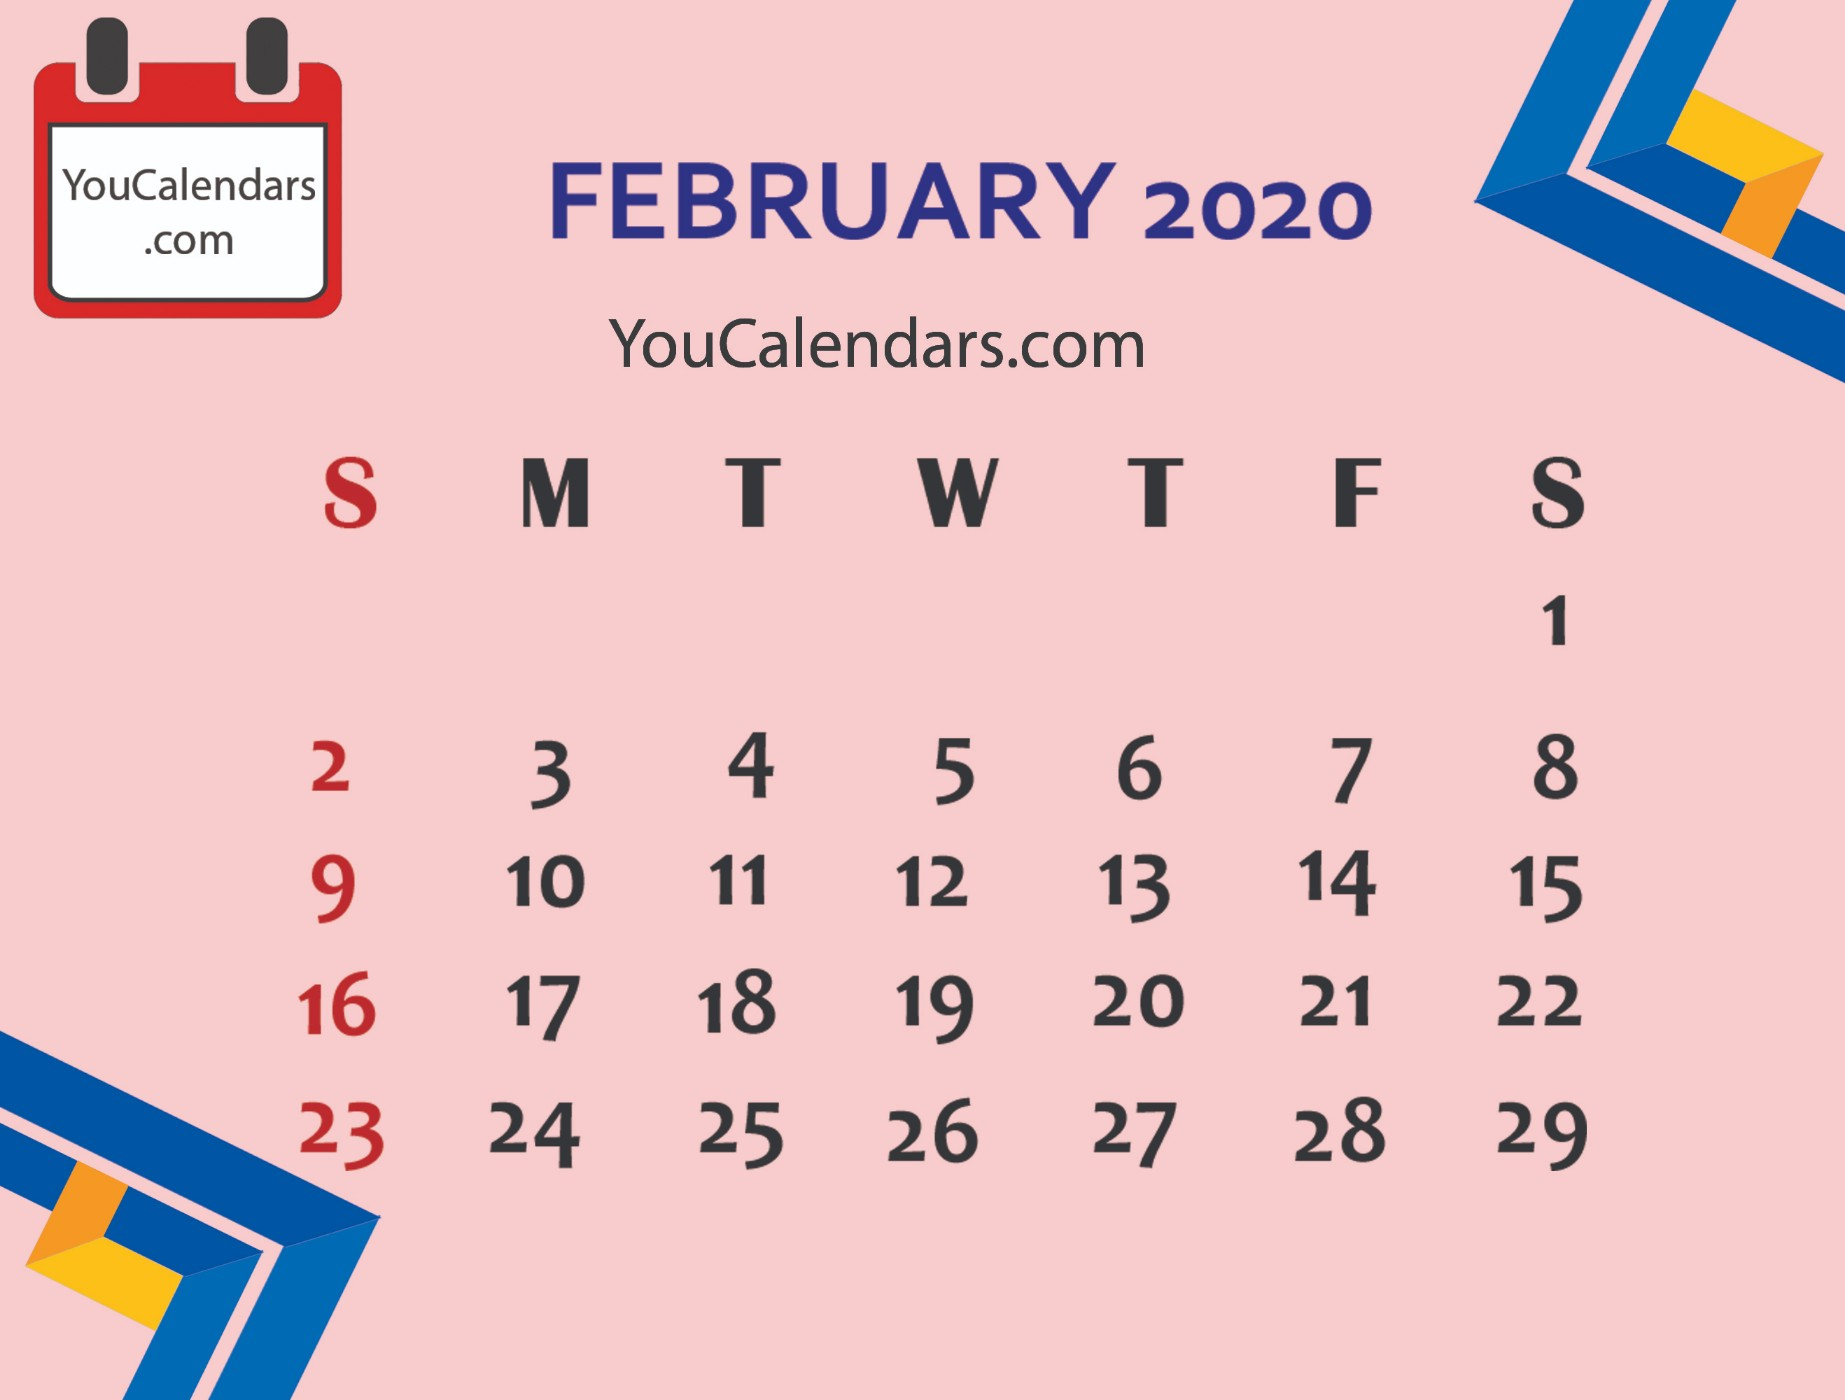 ✅Free February 2020 Calendar Printable Template - You Calendars